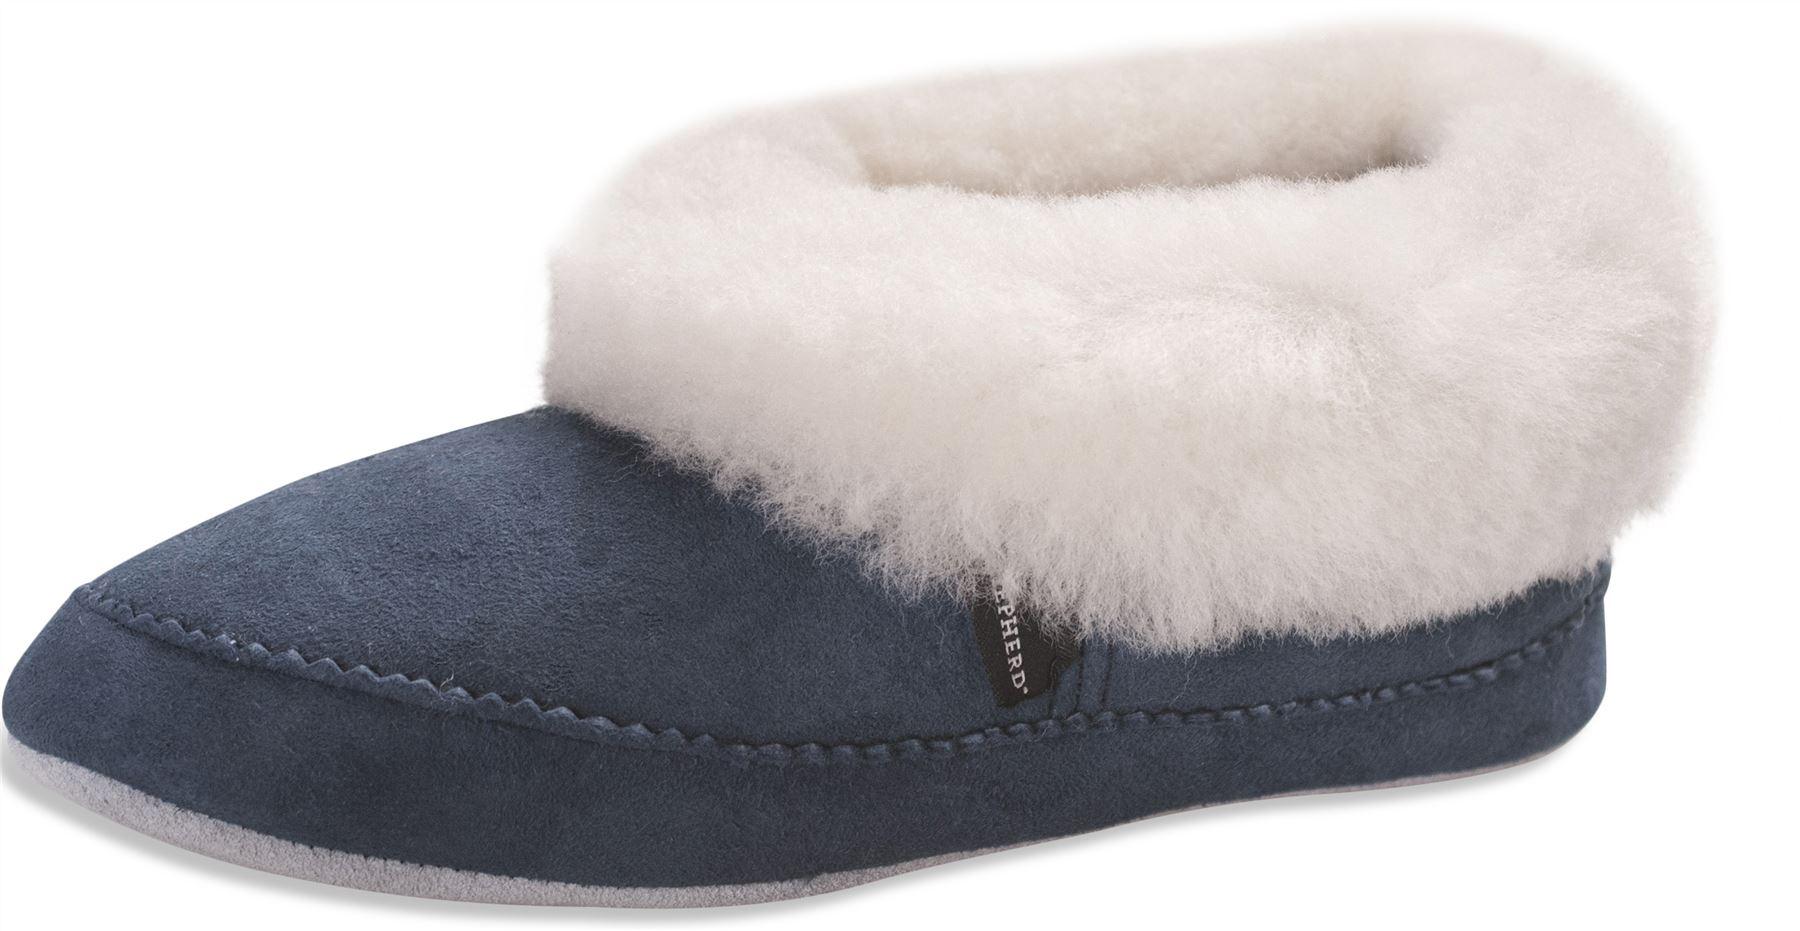 Shepherd Ladies Genuine Sheepskin Slippers Soft Sole Real Womens EMMY 924